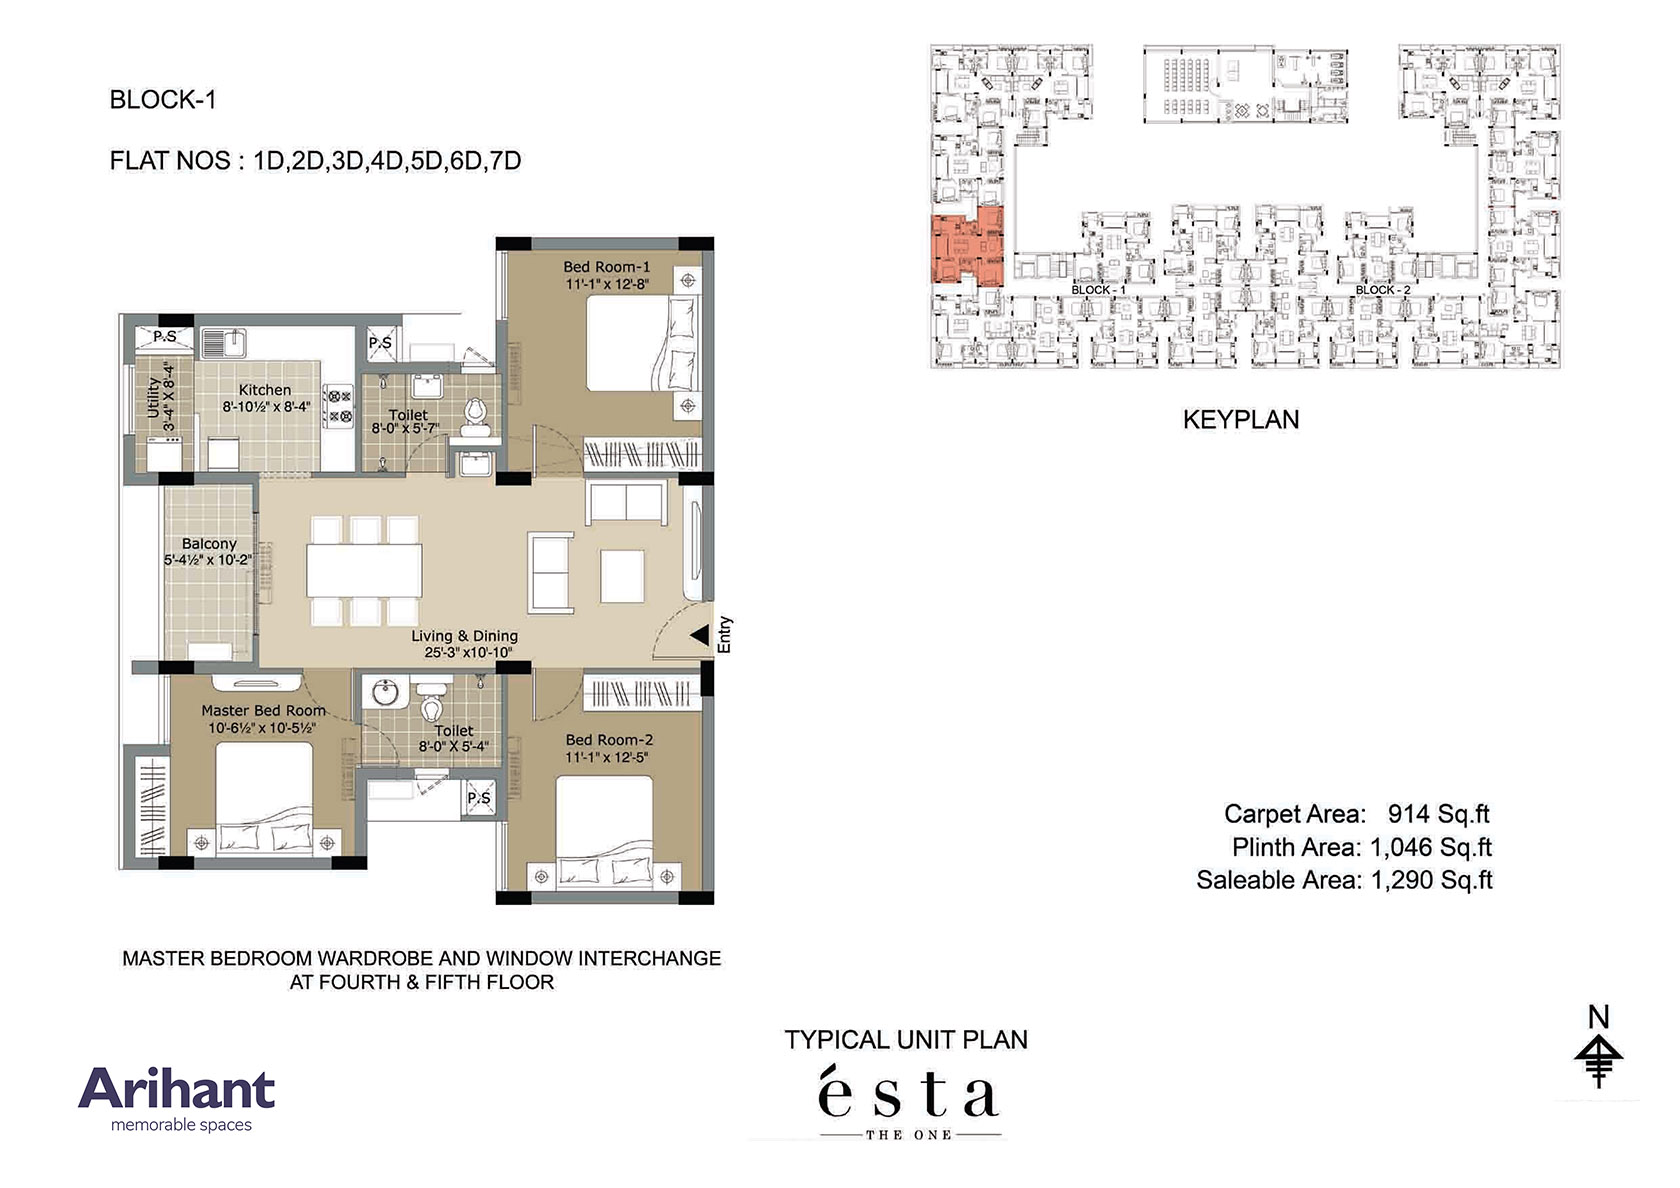 Arihant - Esta_Typical Unit Plan - Block 1 - Type D